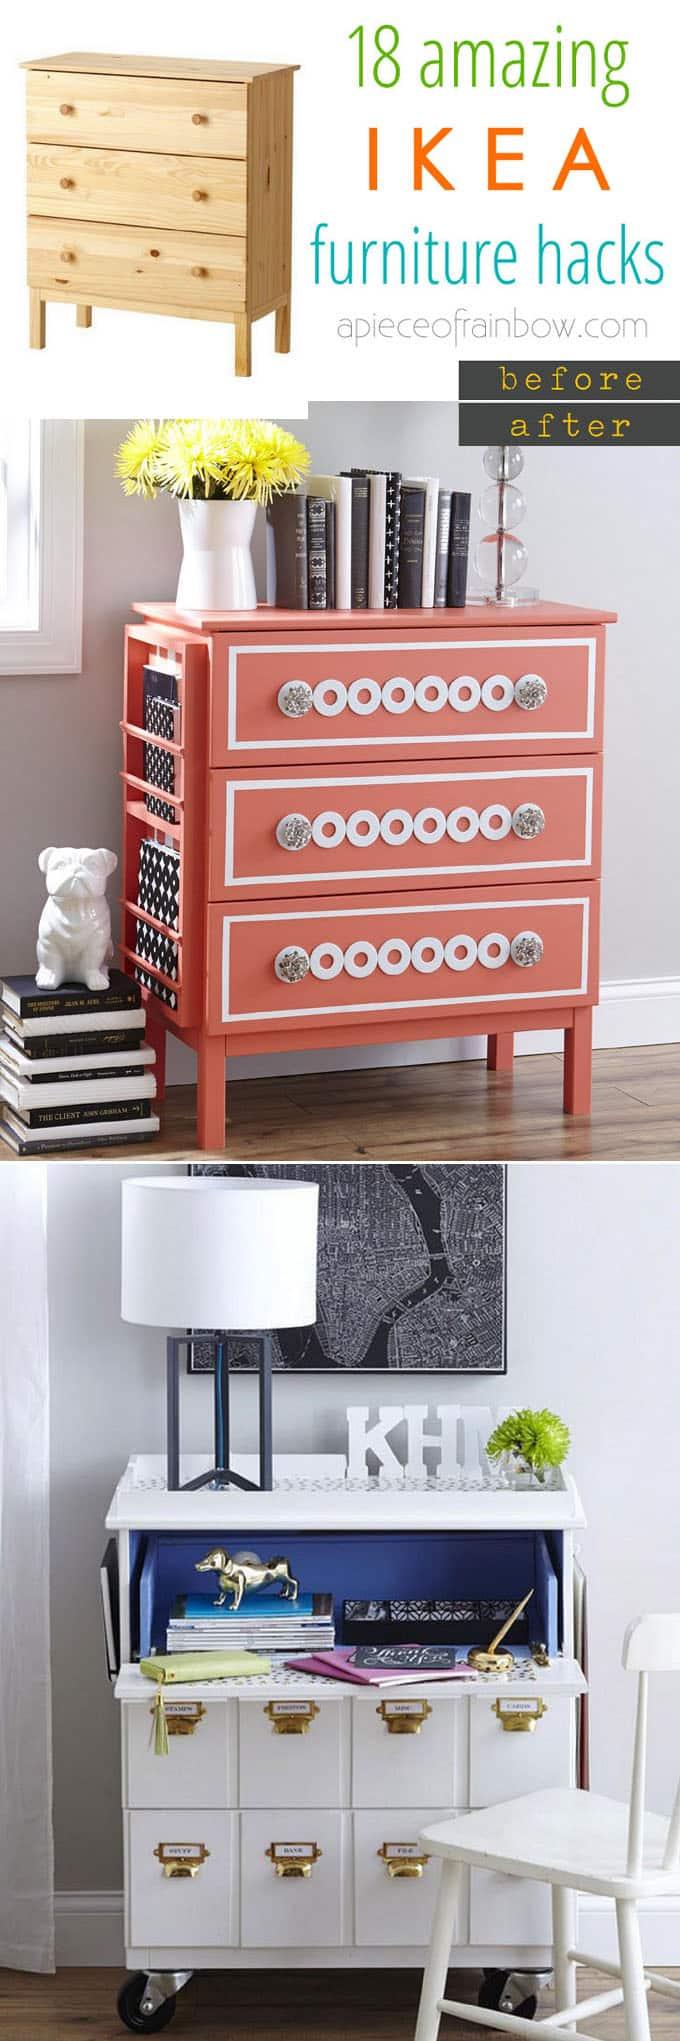 ikea-hacks-custom-furniture-apieceofrainbow-4